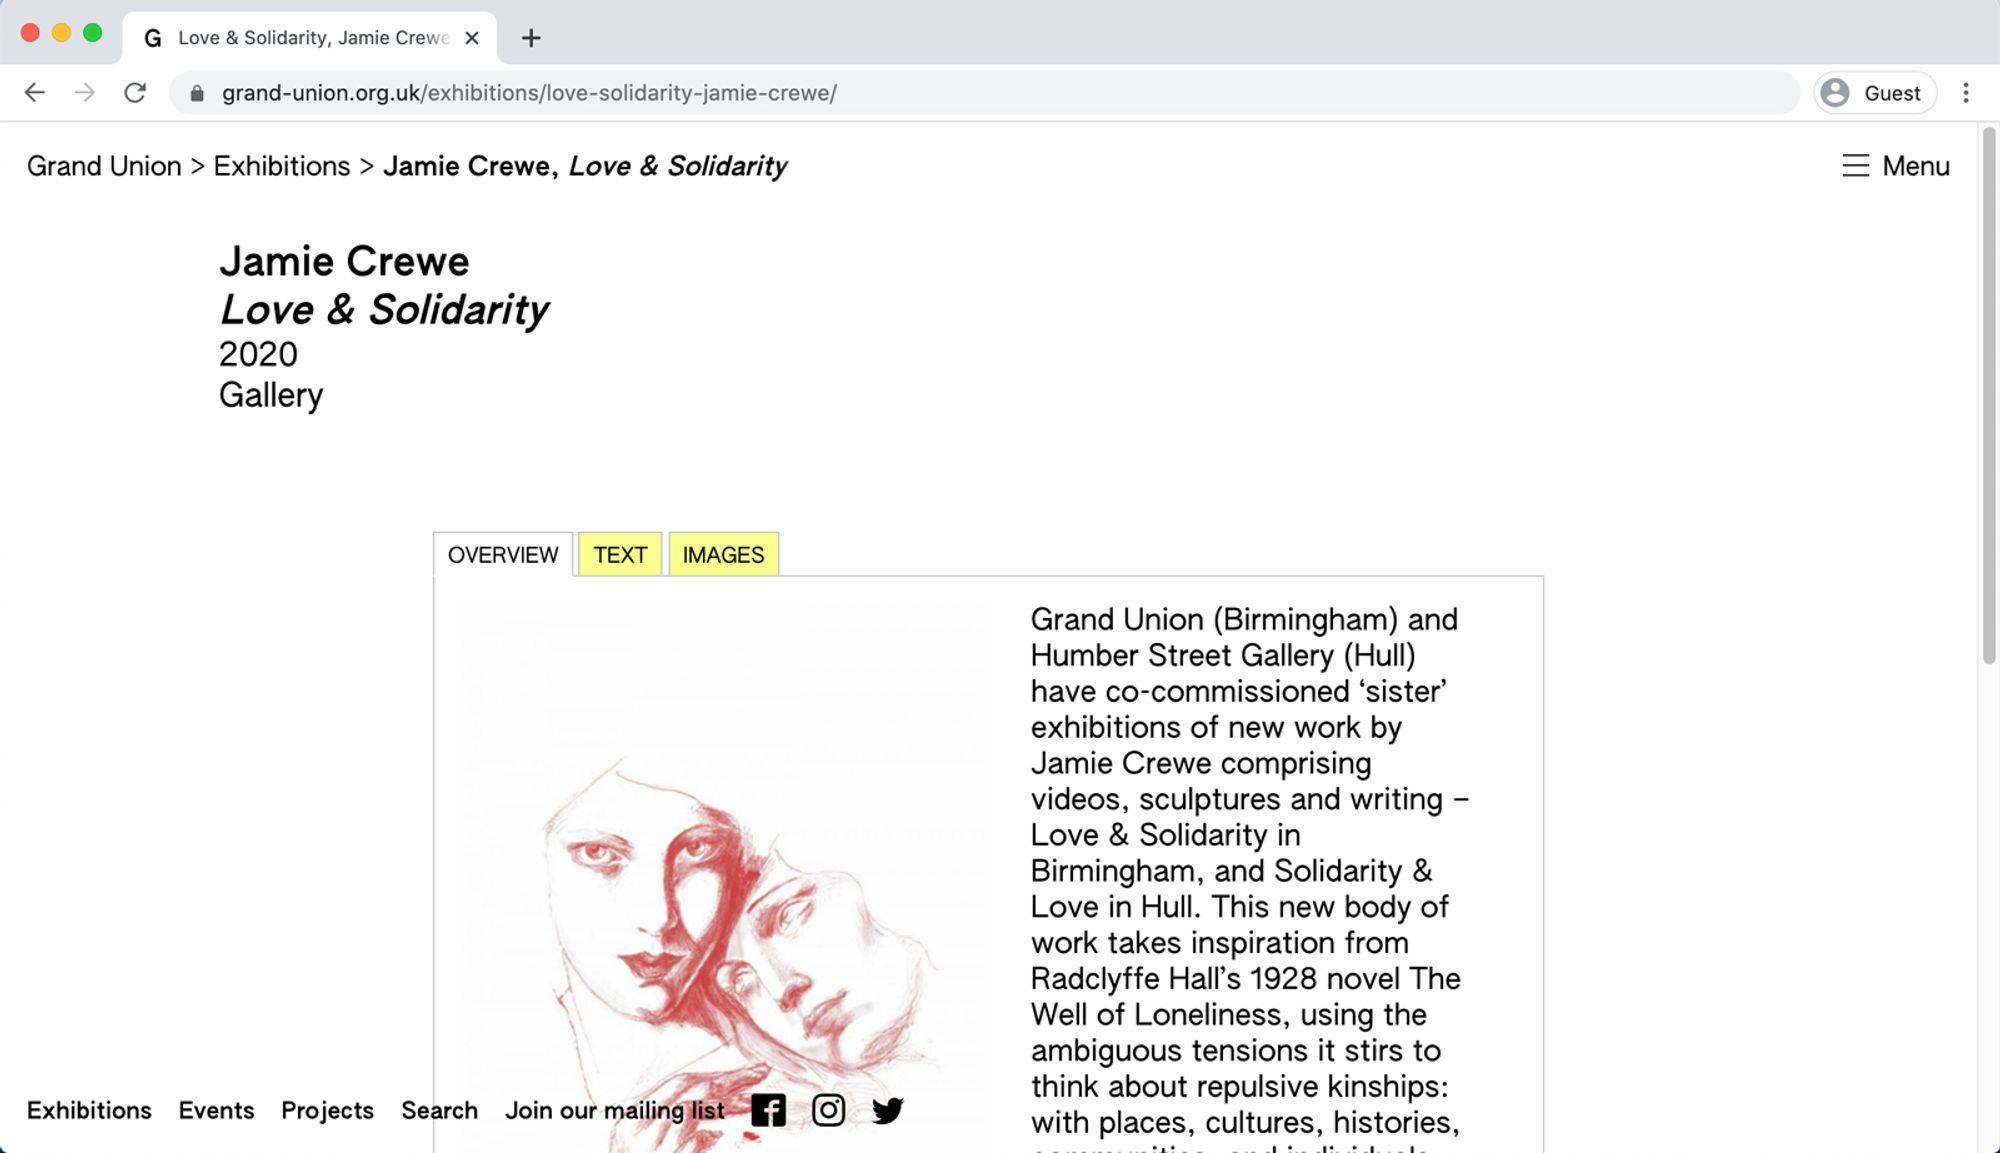 Screen grab of Grand Union website